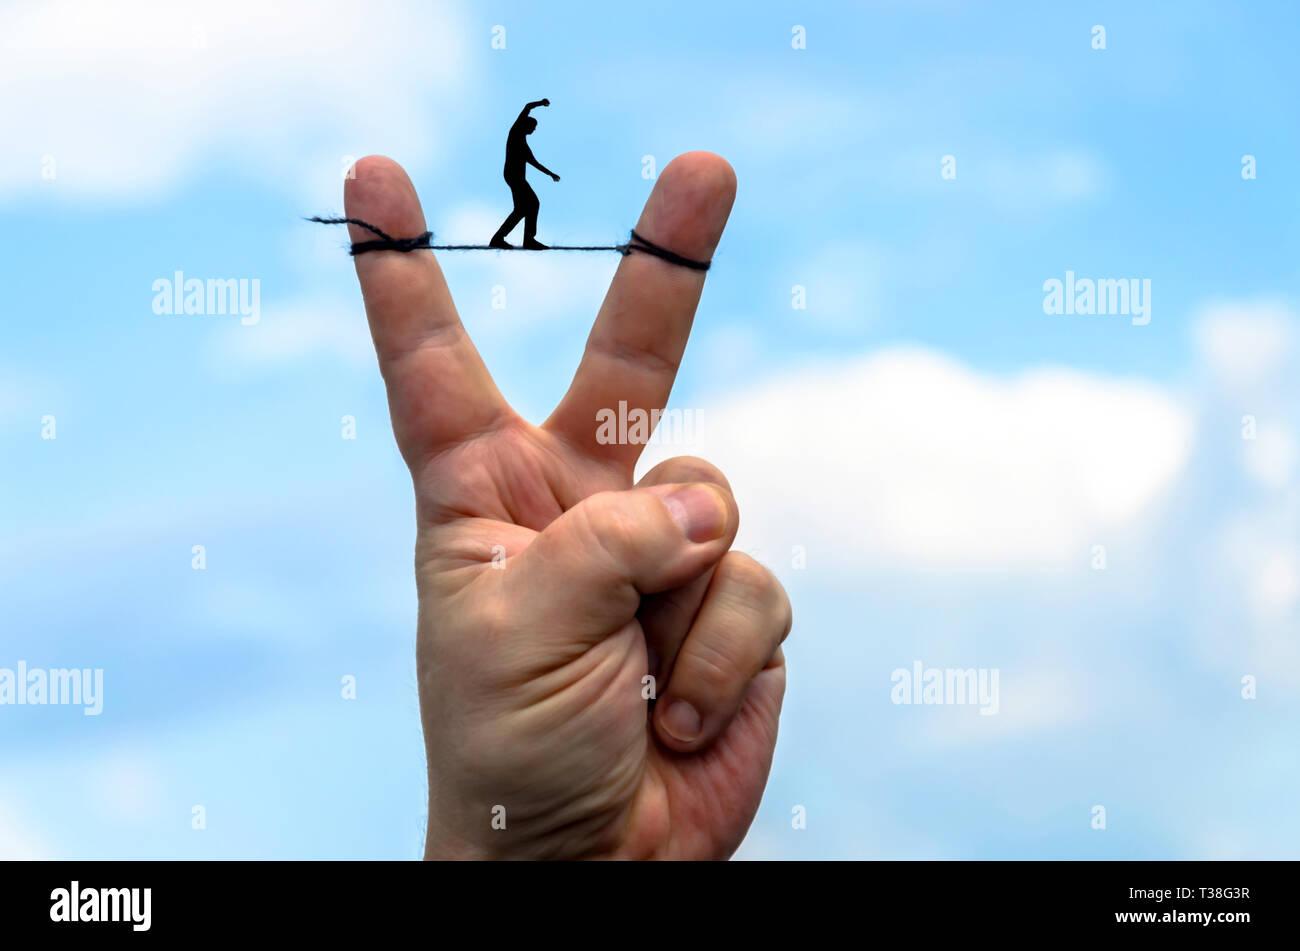 Hand Sign Language Stock Photos & Hand Sign Language Stock